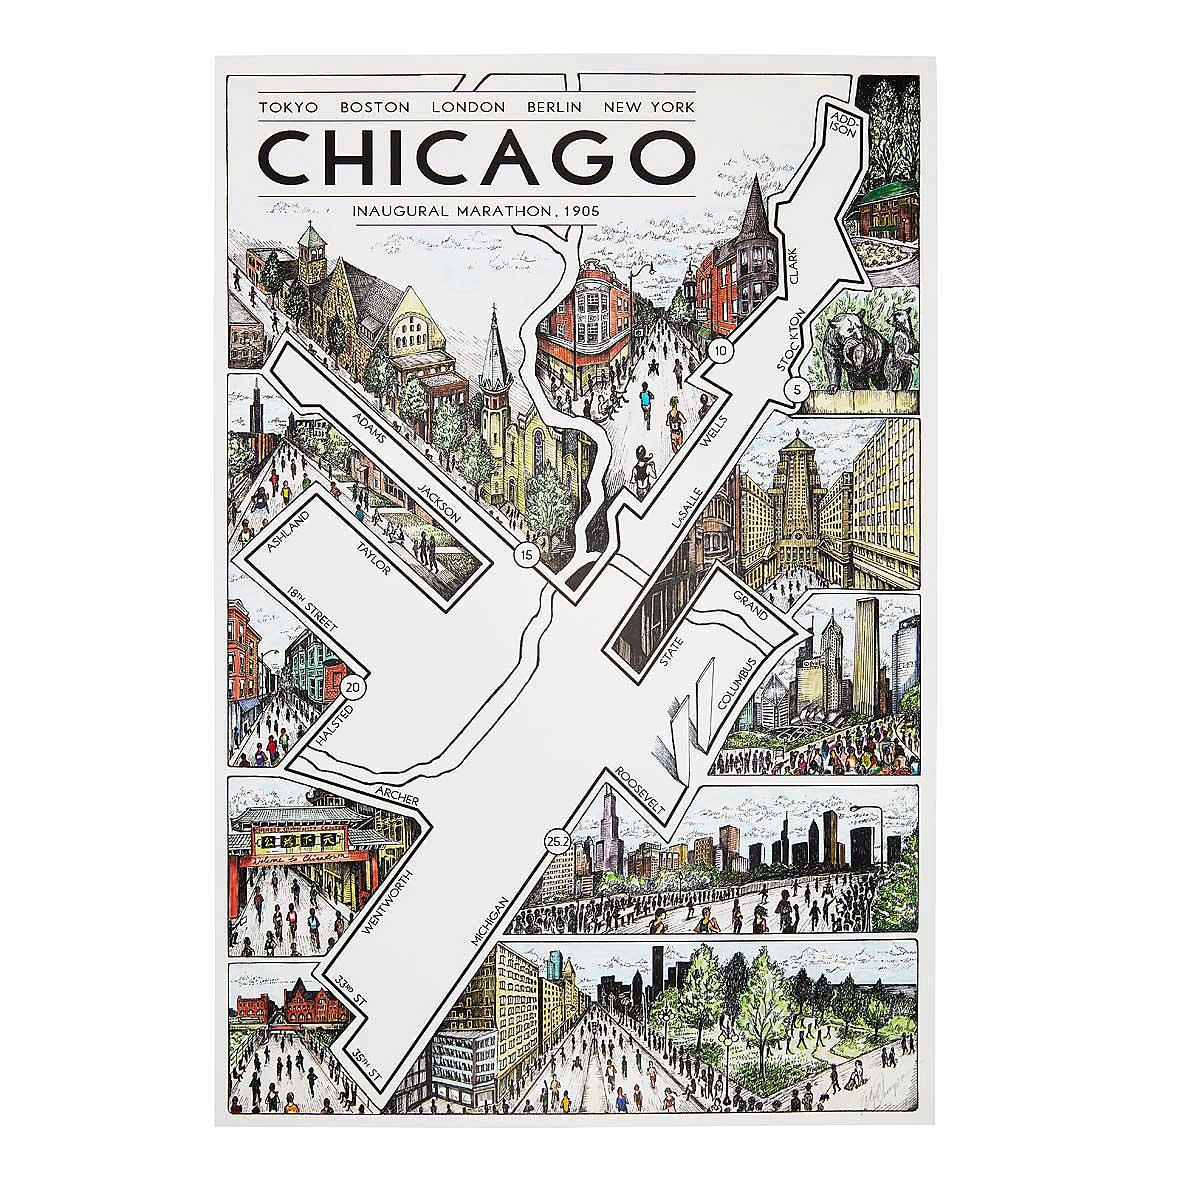 Chicago Marathon Map Chicago marathon artwork route map